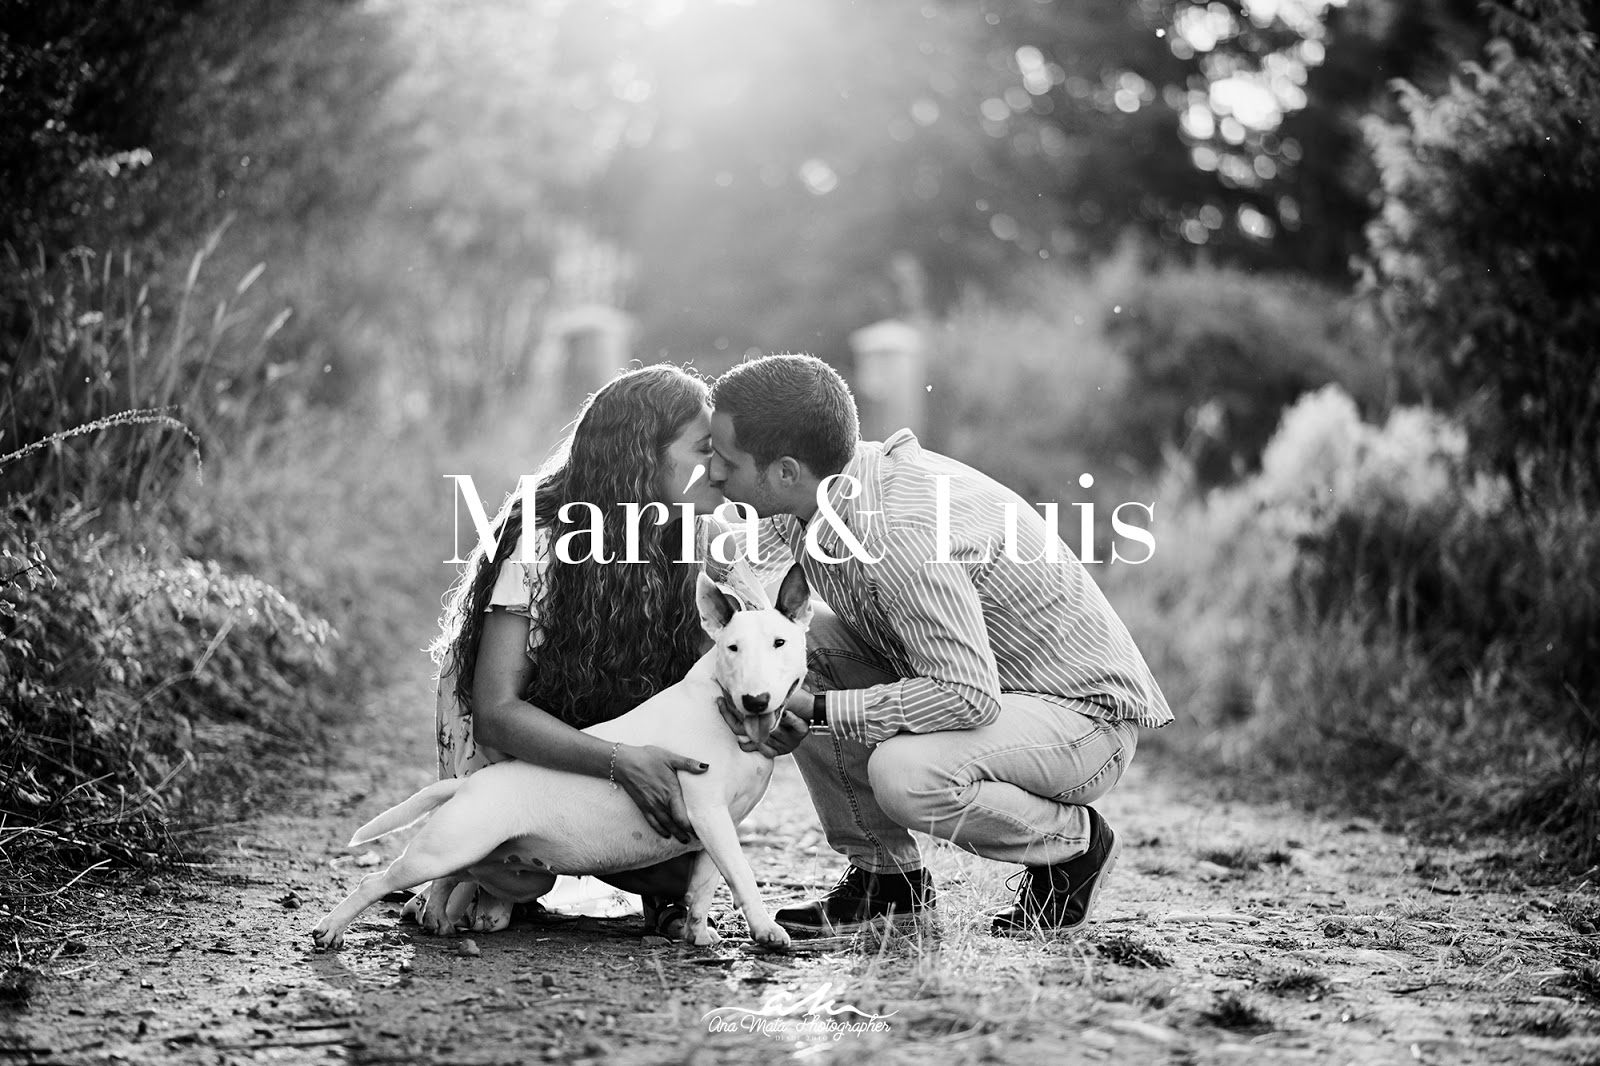 María & Luis. Agosto 2018